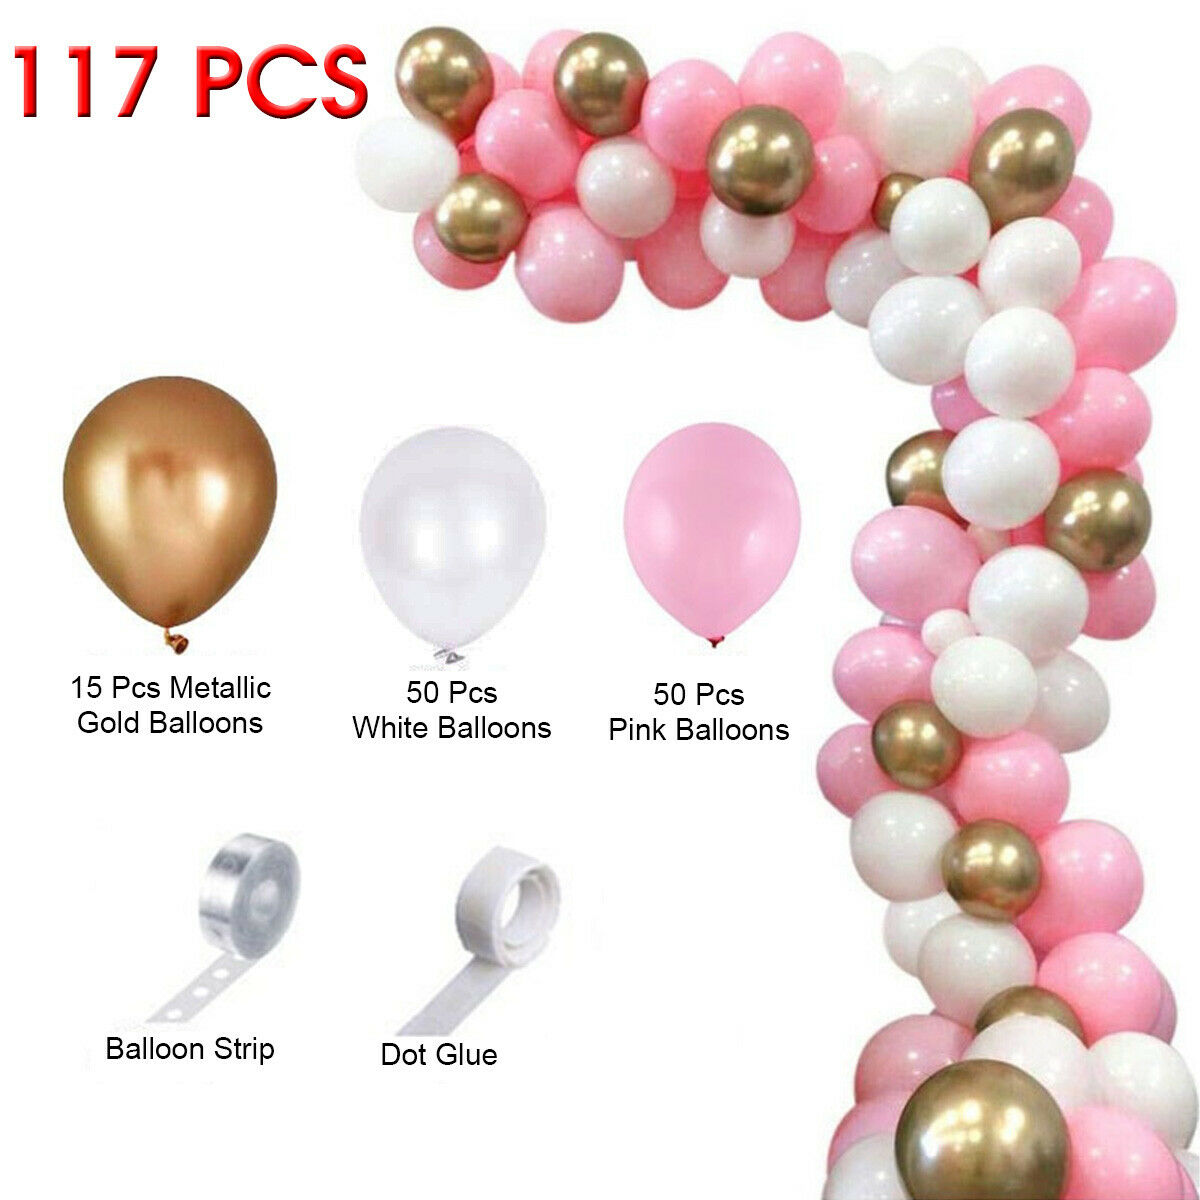 Multi-PCS Balloons Set Balloon Arch Kit Birthday Wedding Baby Shower Party Decor